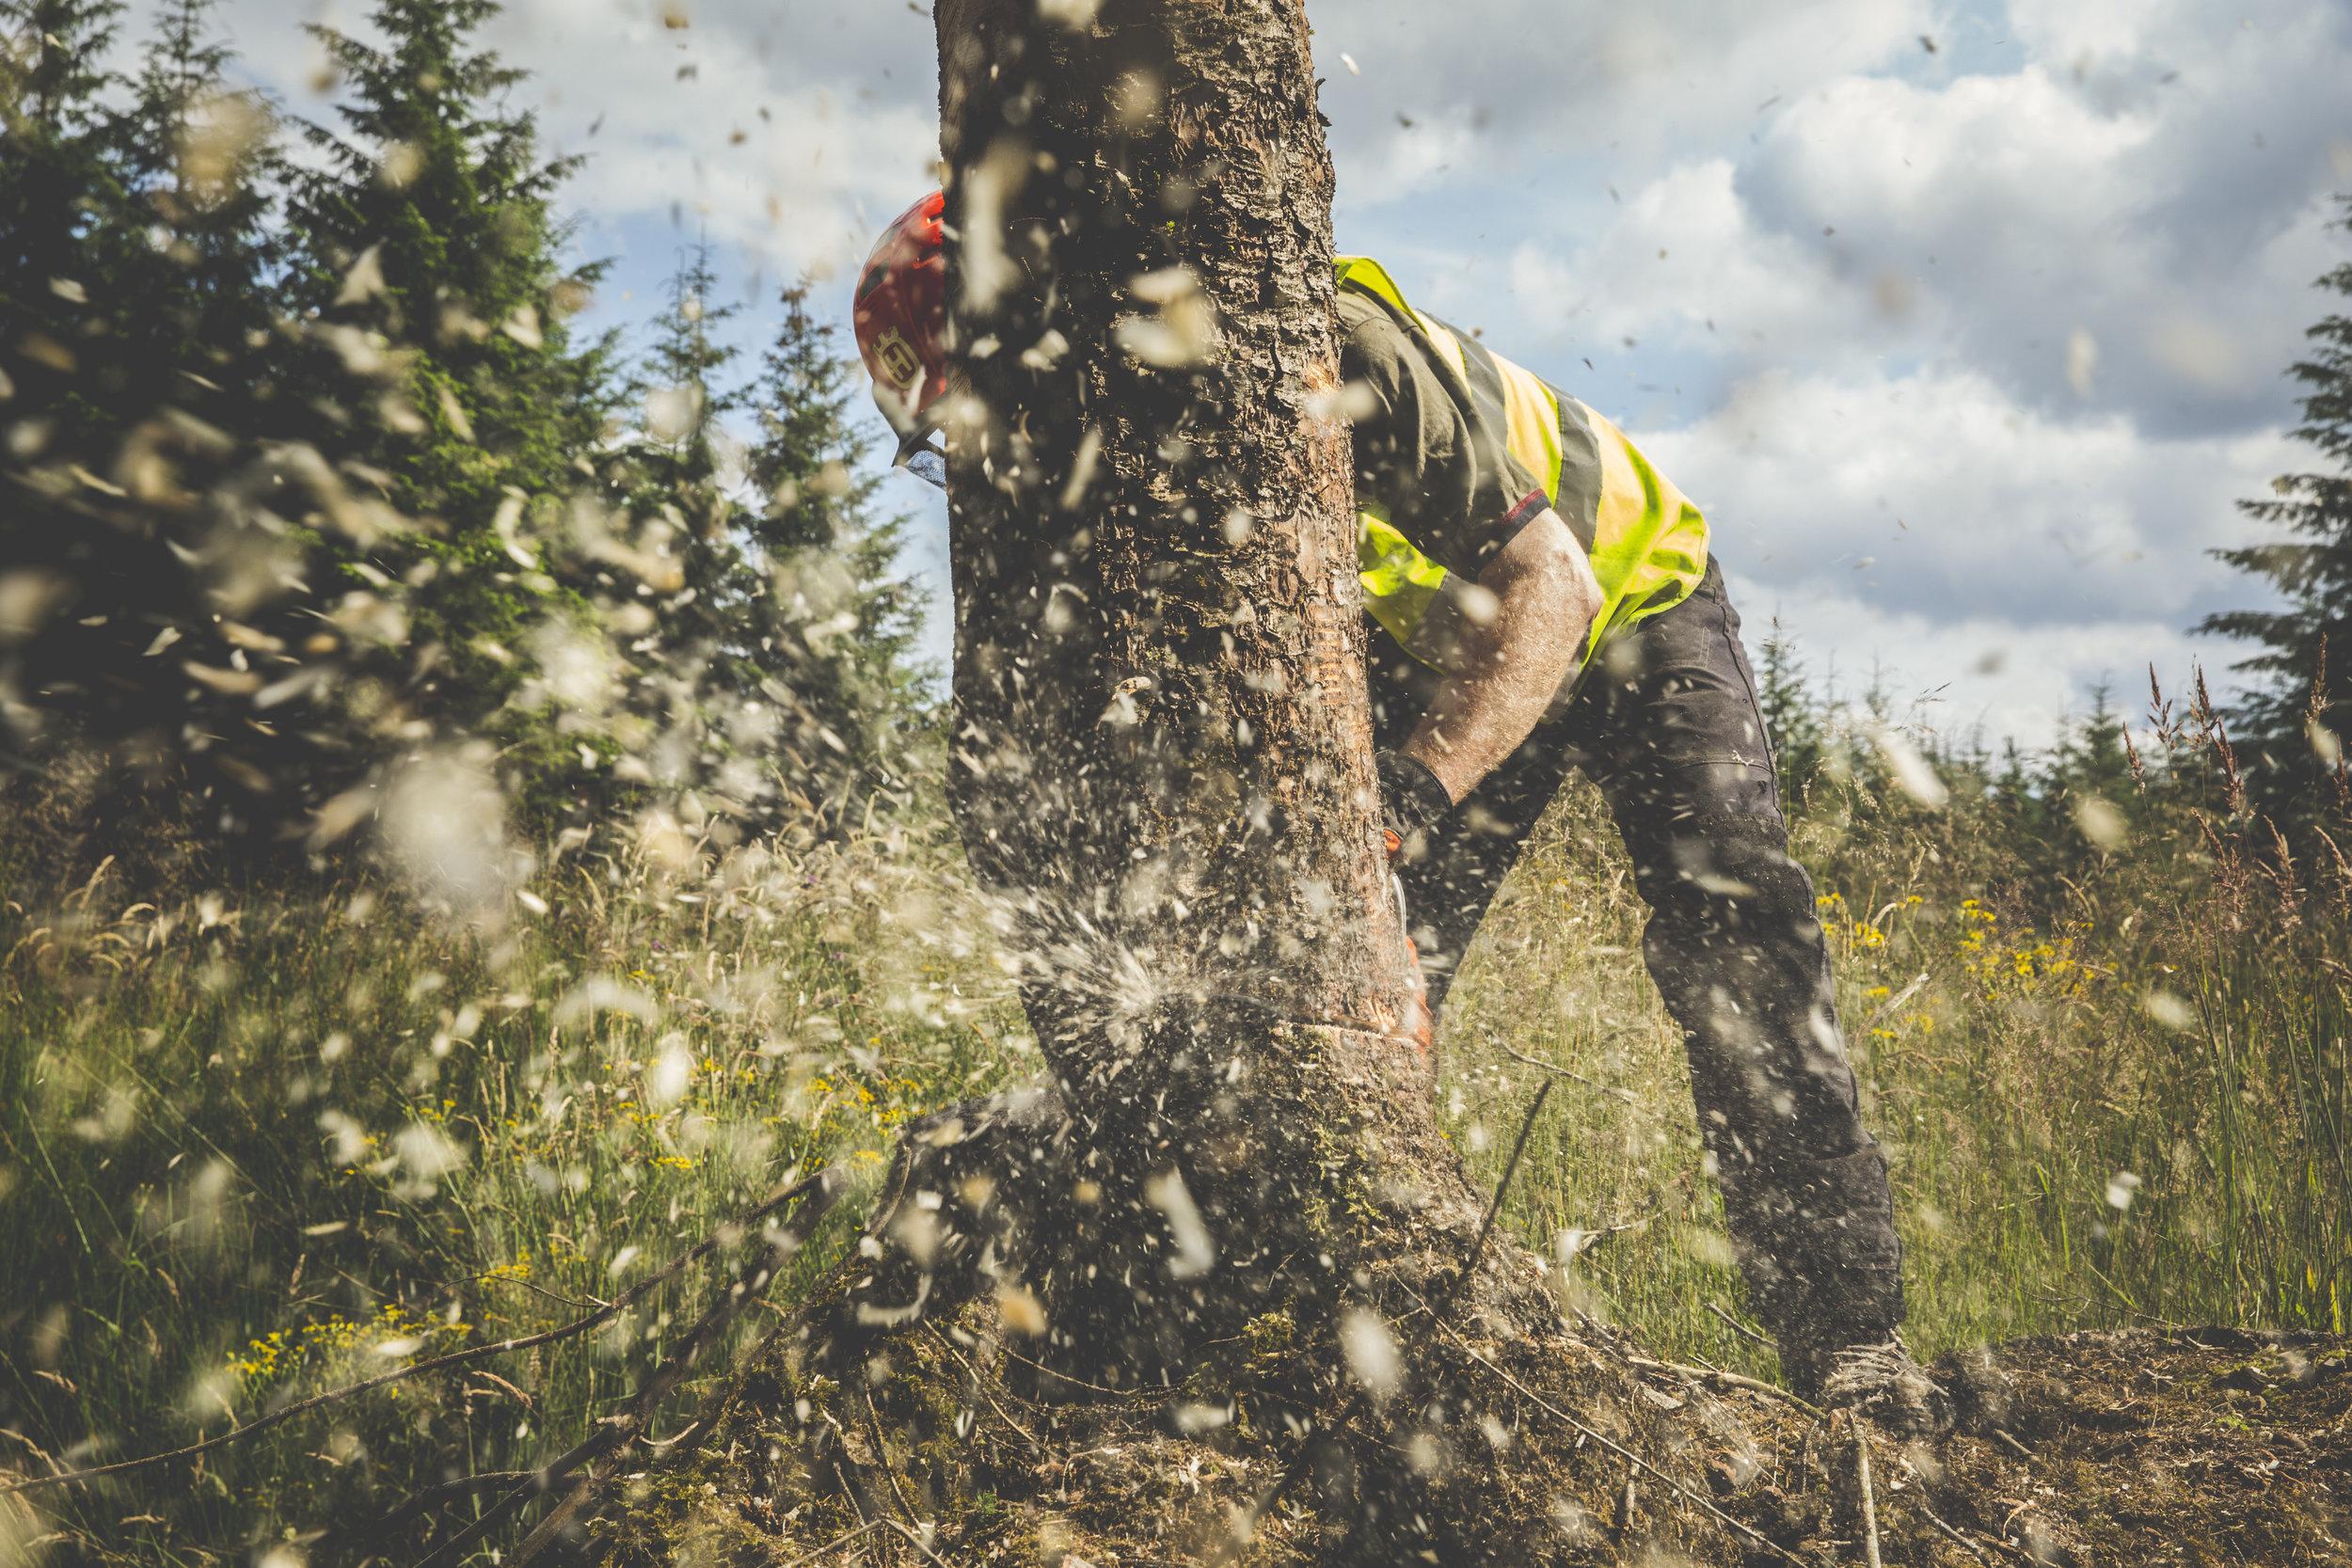 FOREST MANTENANCE